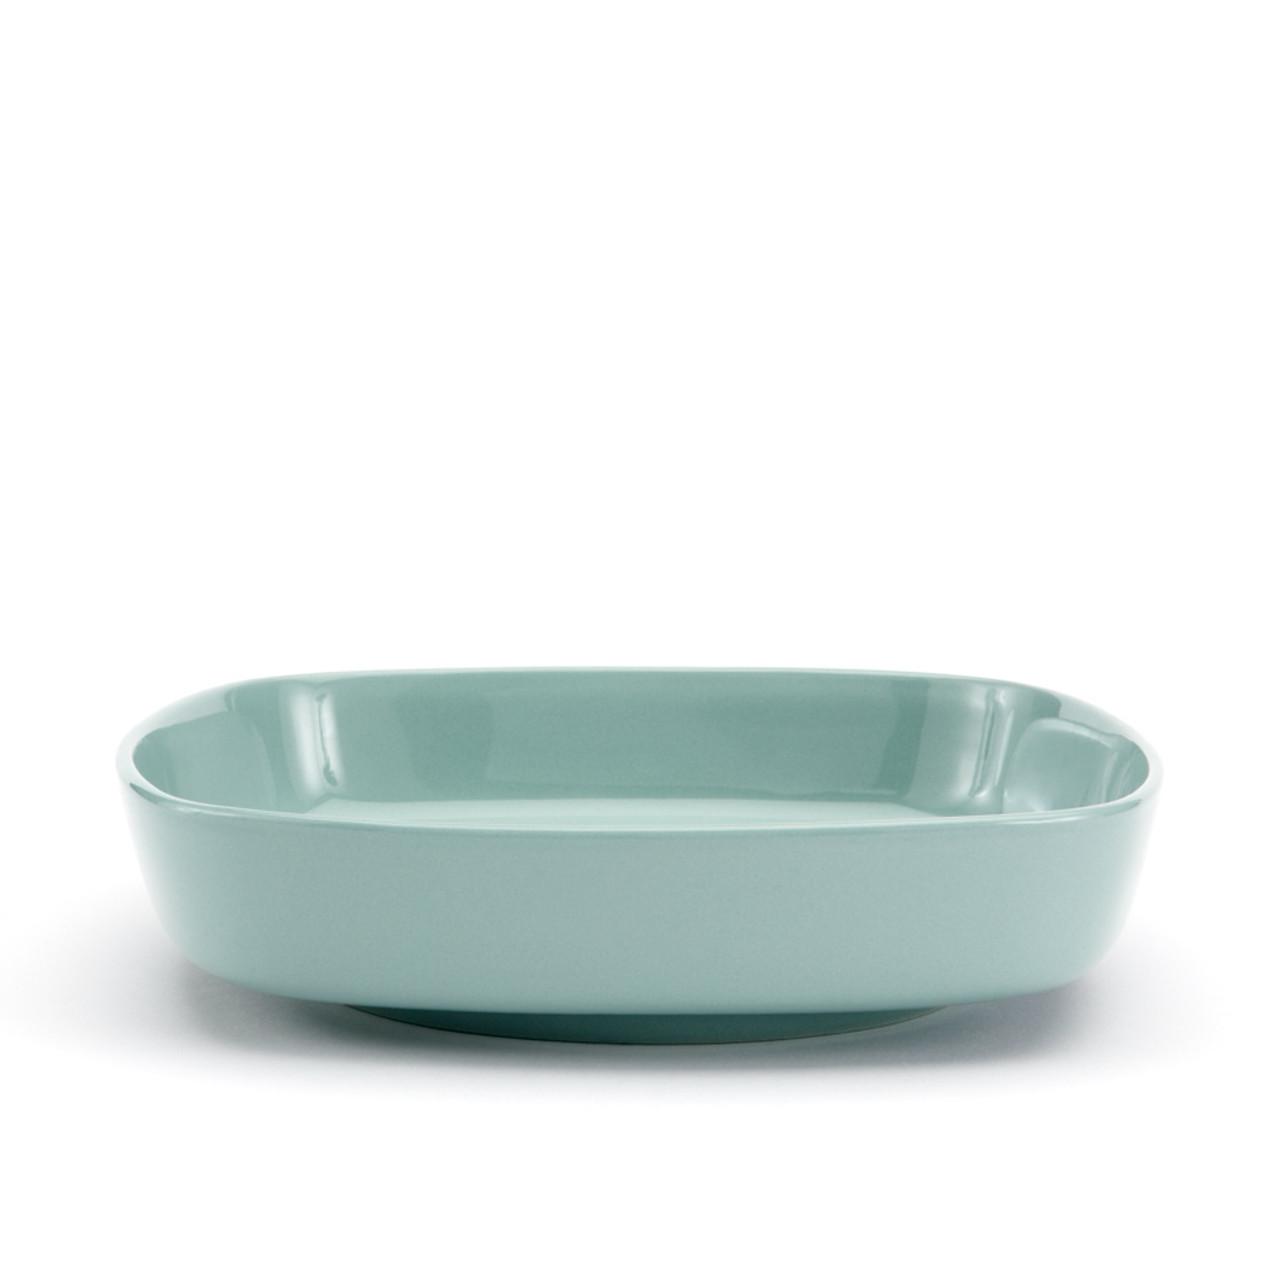 Karo Dinnerware